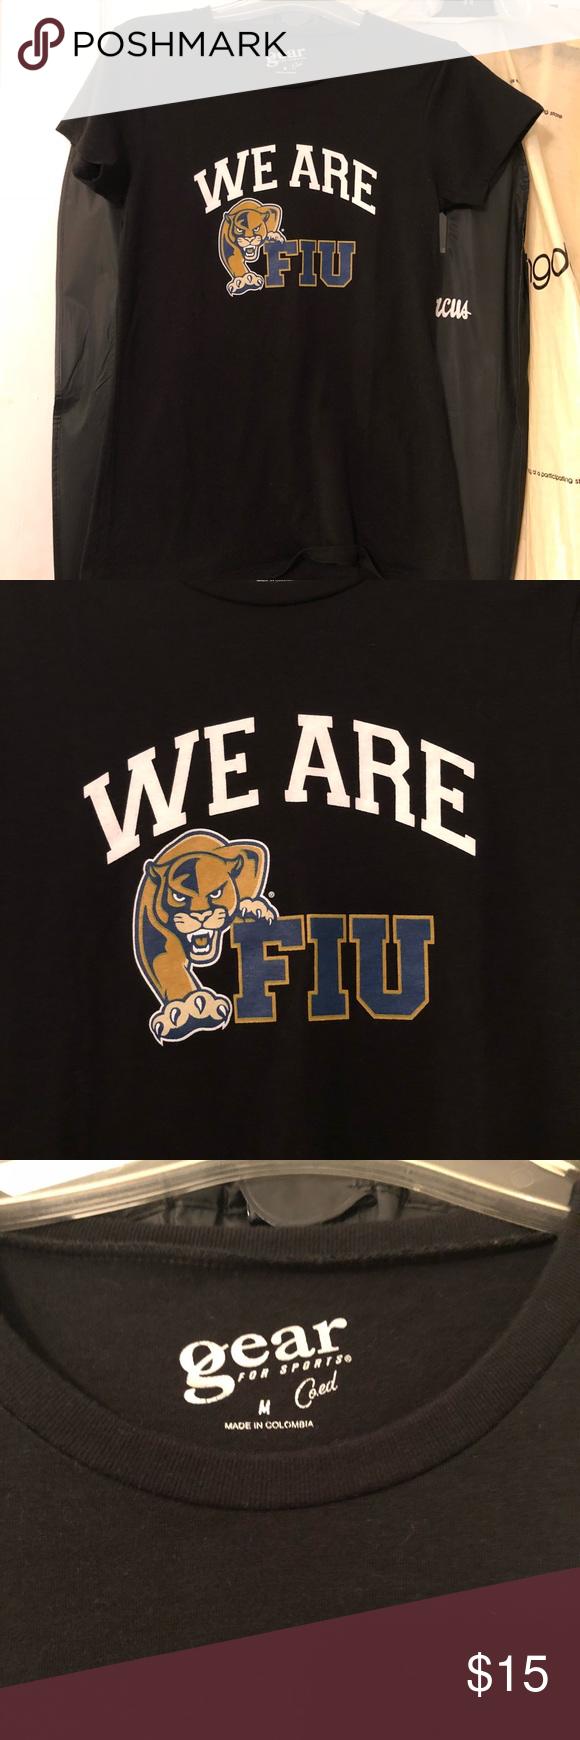 Florida International University Tee Show Your Panther Spirit With This Black Fiu Tee Purchased At The B University Tees Florida International University Tees